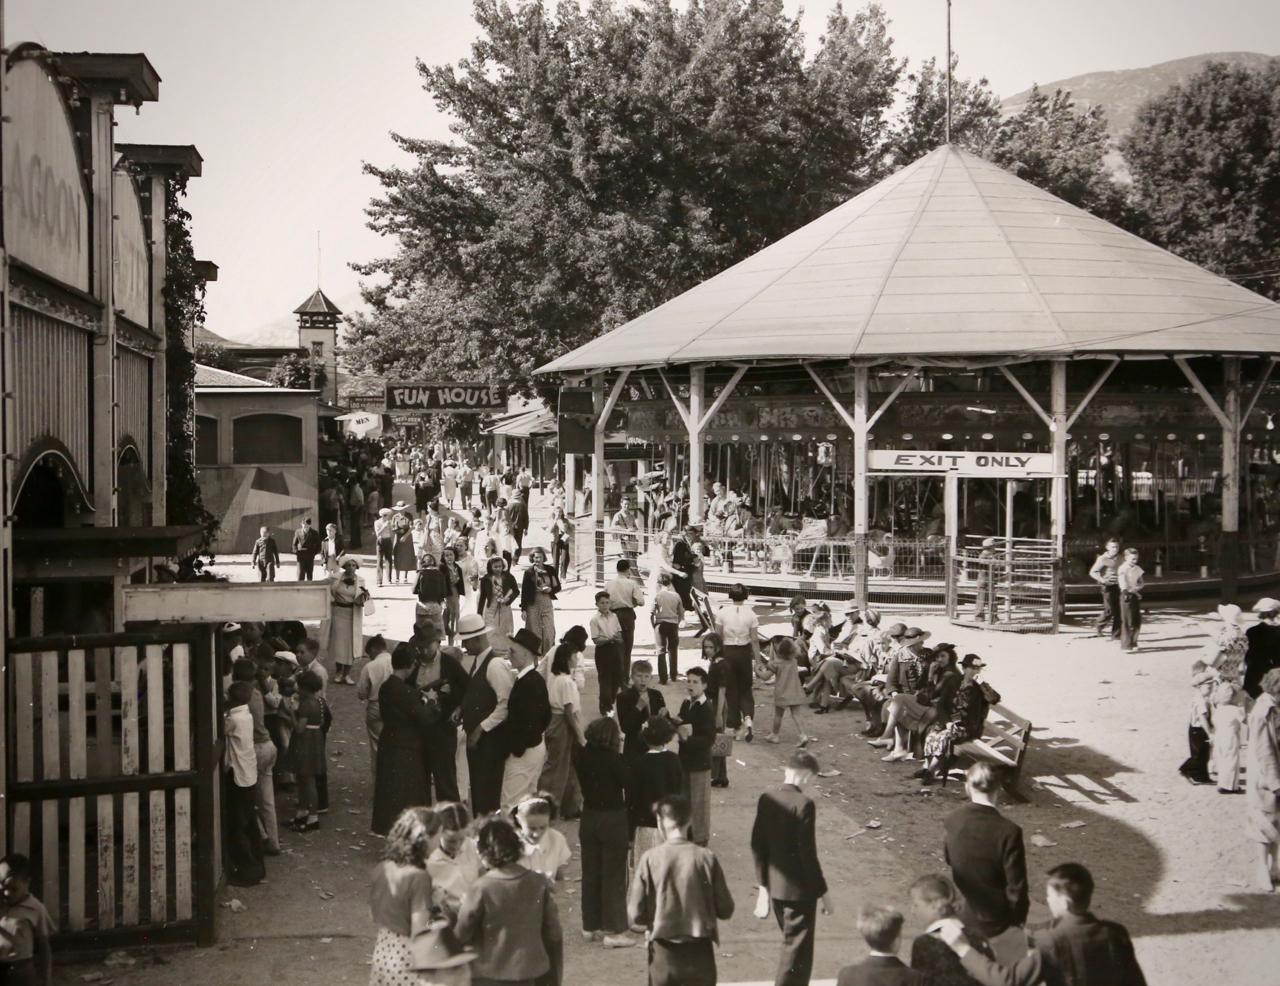 Images courtesy Utah State Historical Society.